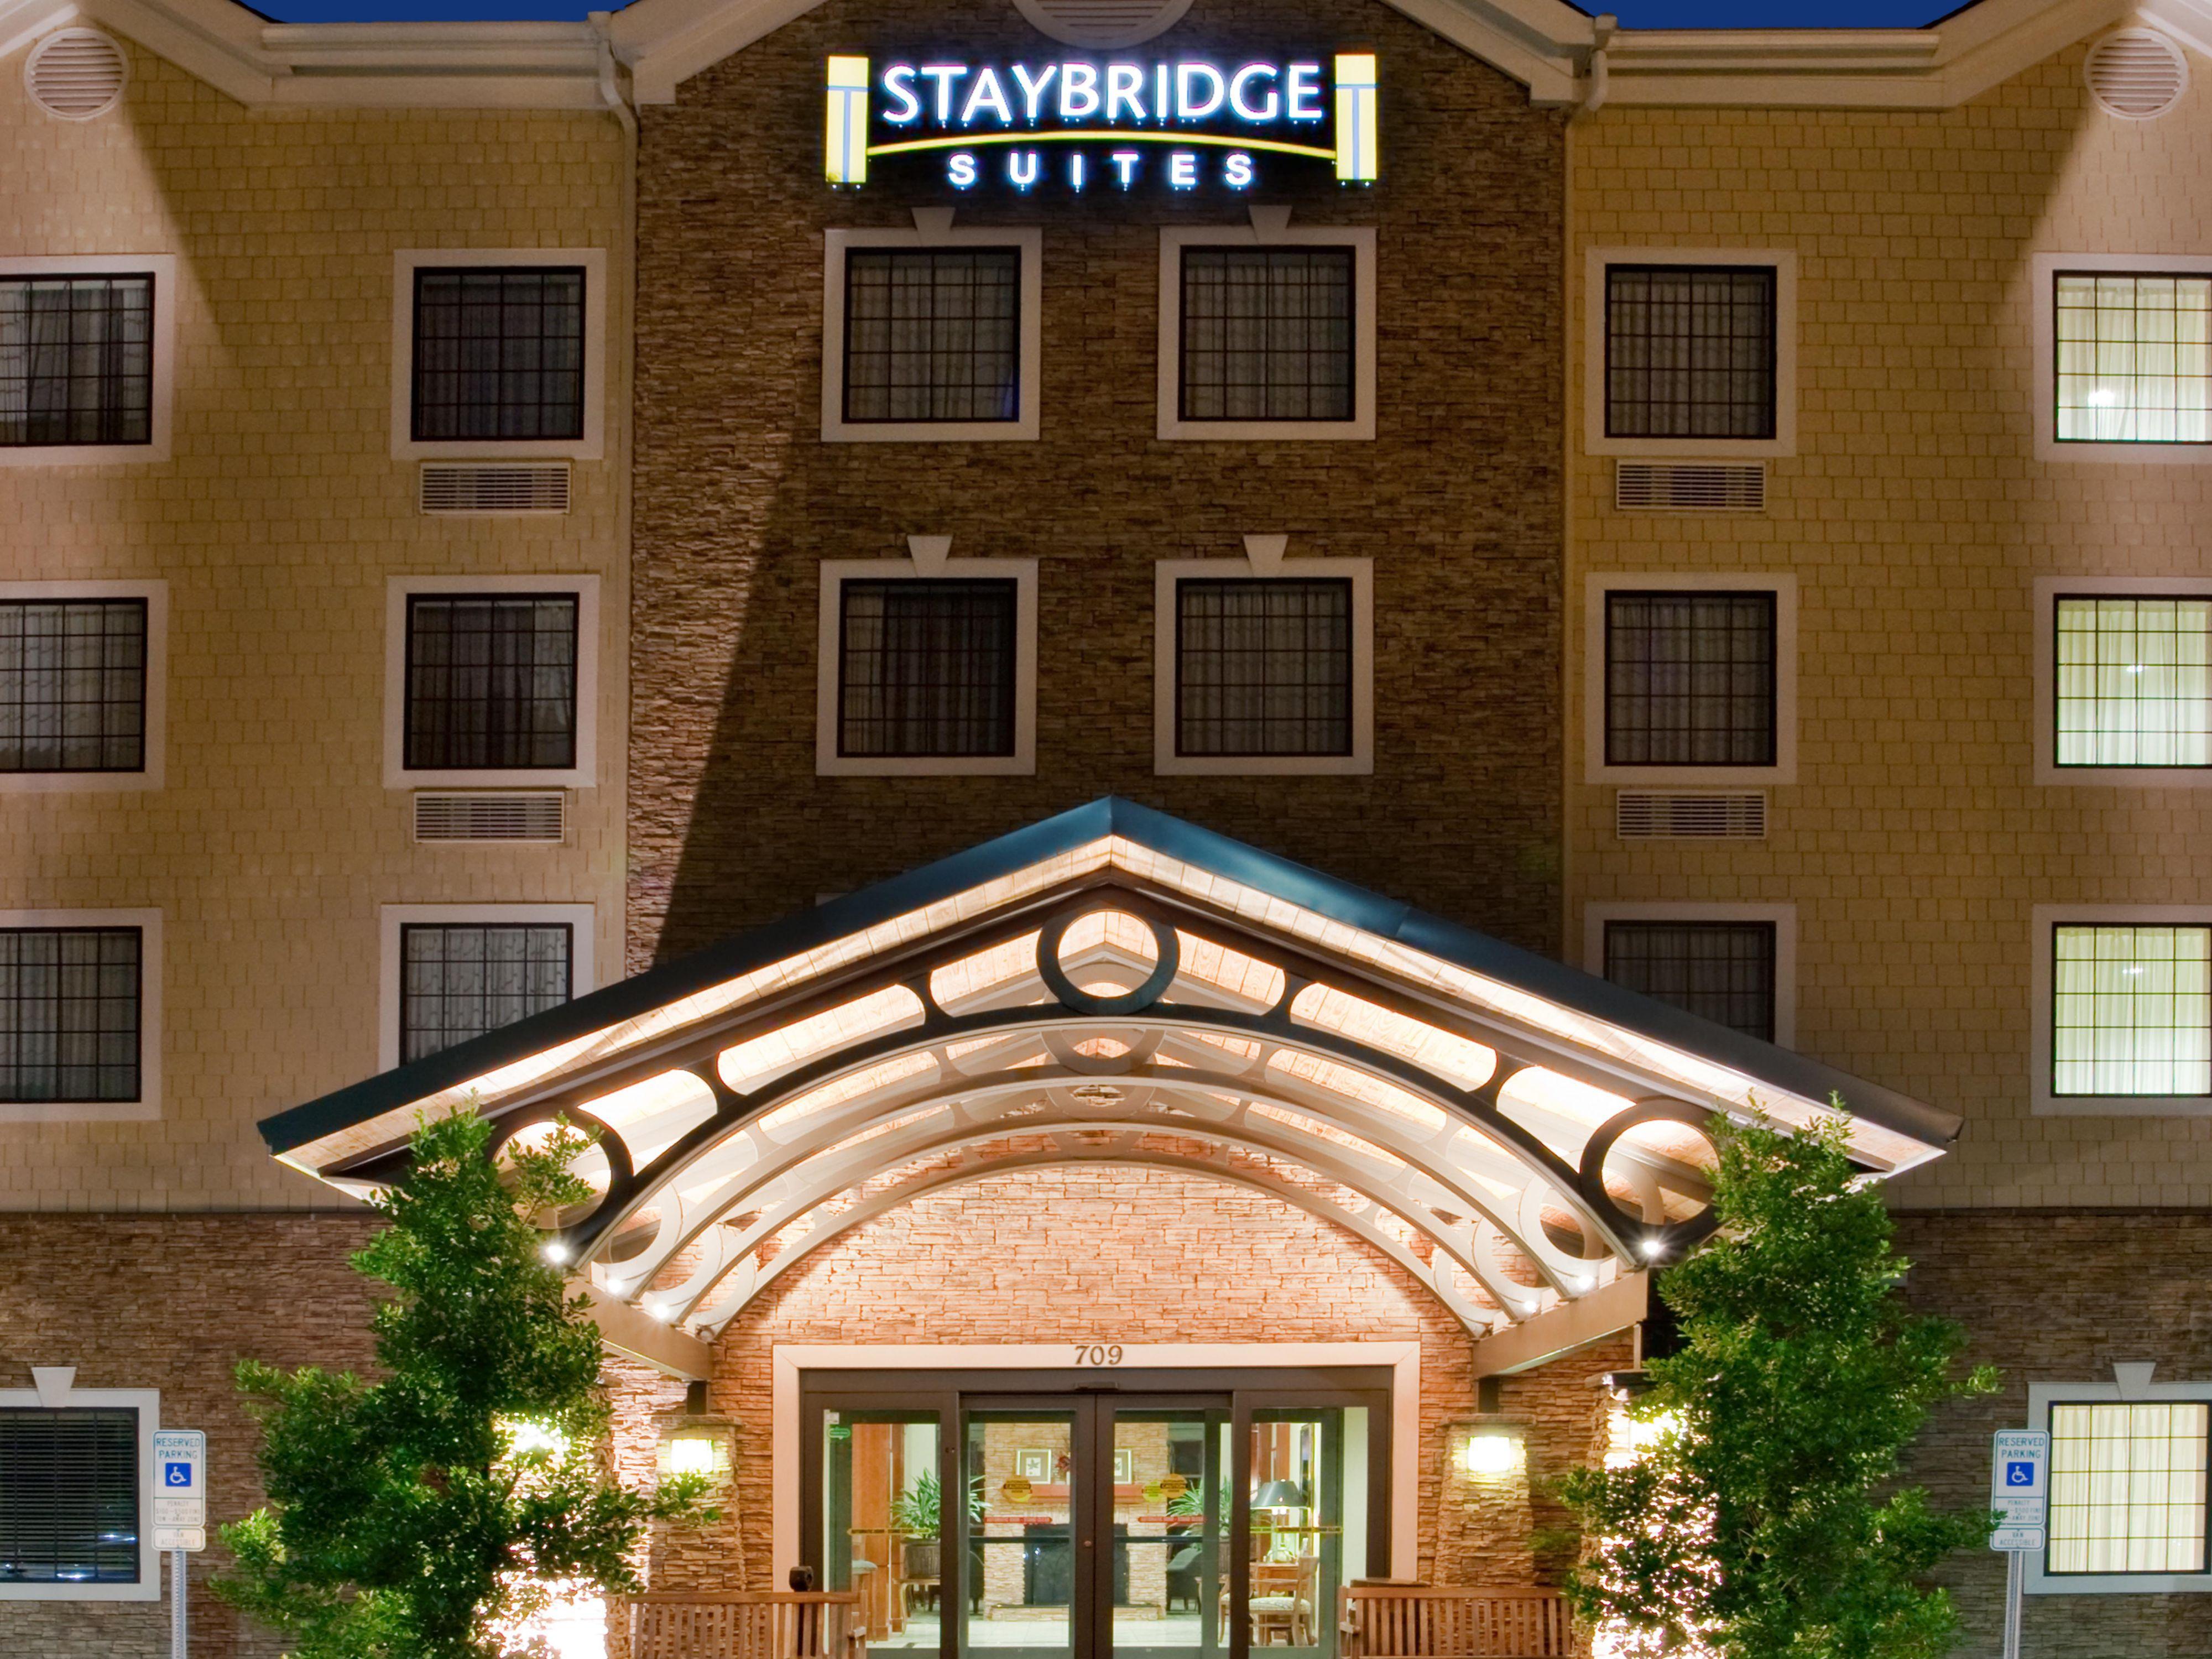 Things to do in Chesapeake near Staybridge Suites Chesapeake ...